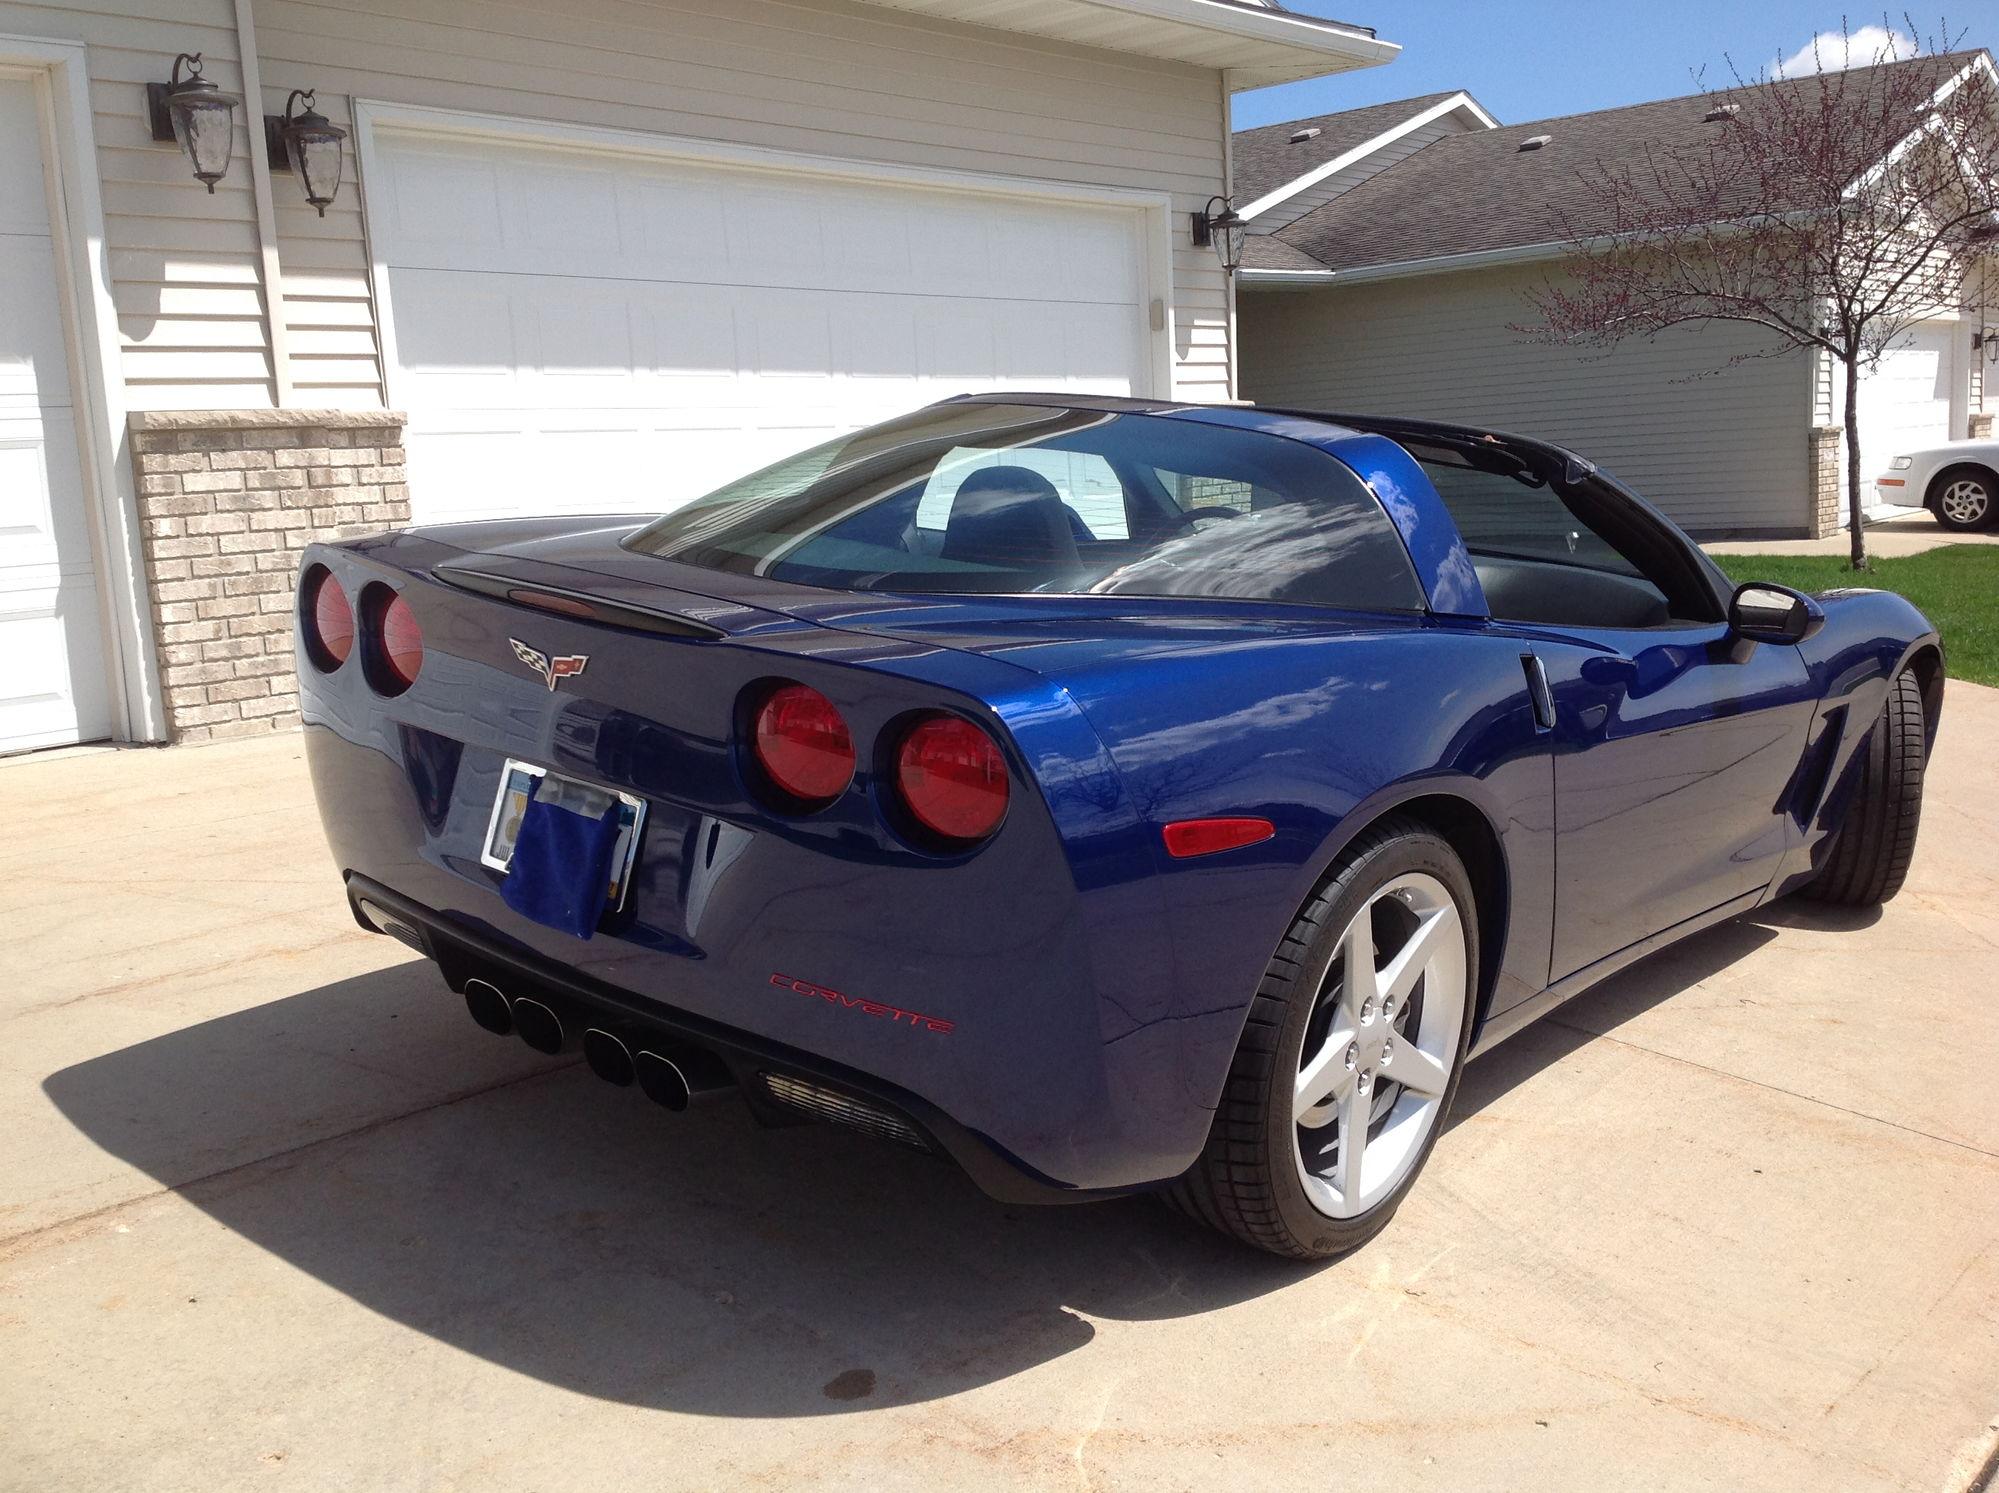 FS For Sale 2005 Corvette Coupe Blue CorvetteForum